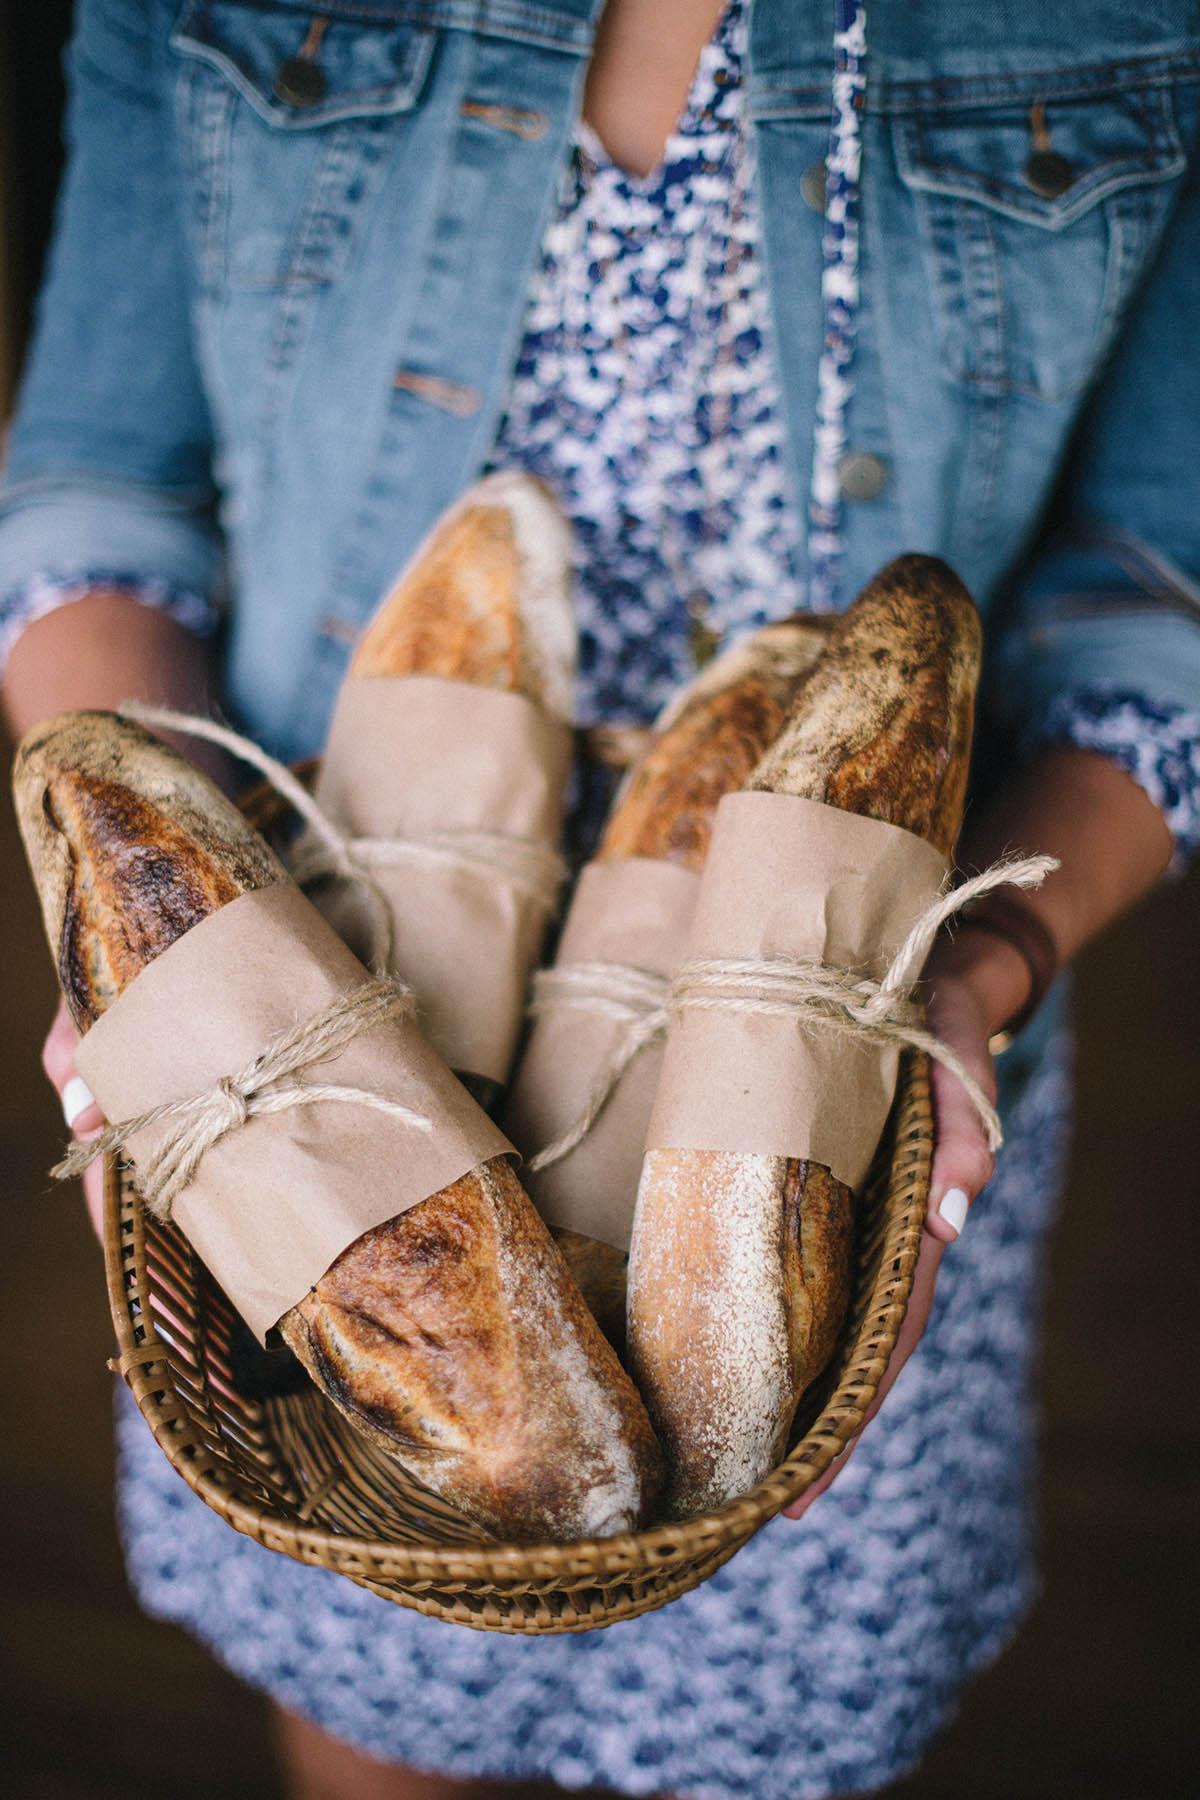 basket of rustic loaves of bread